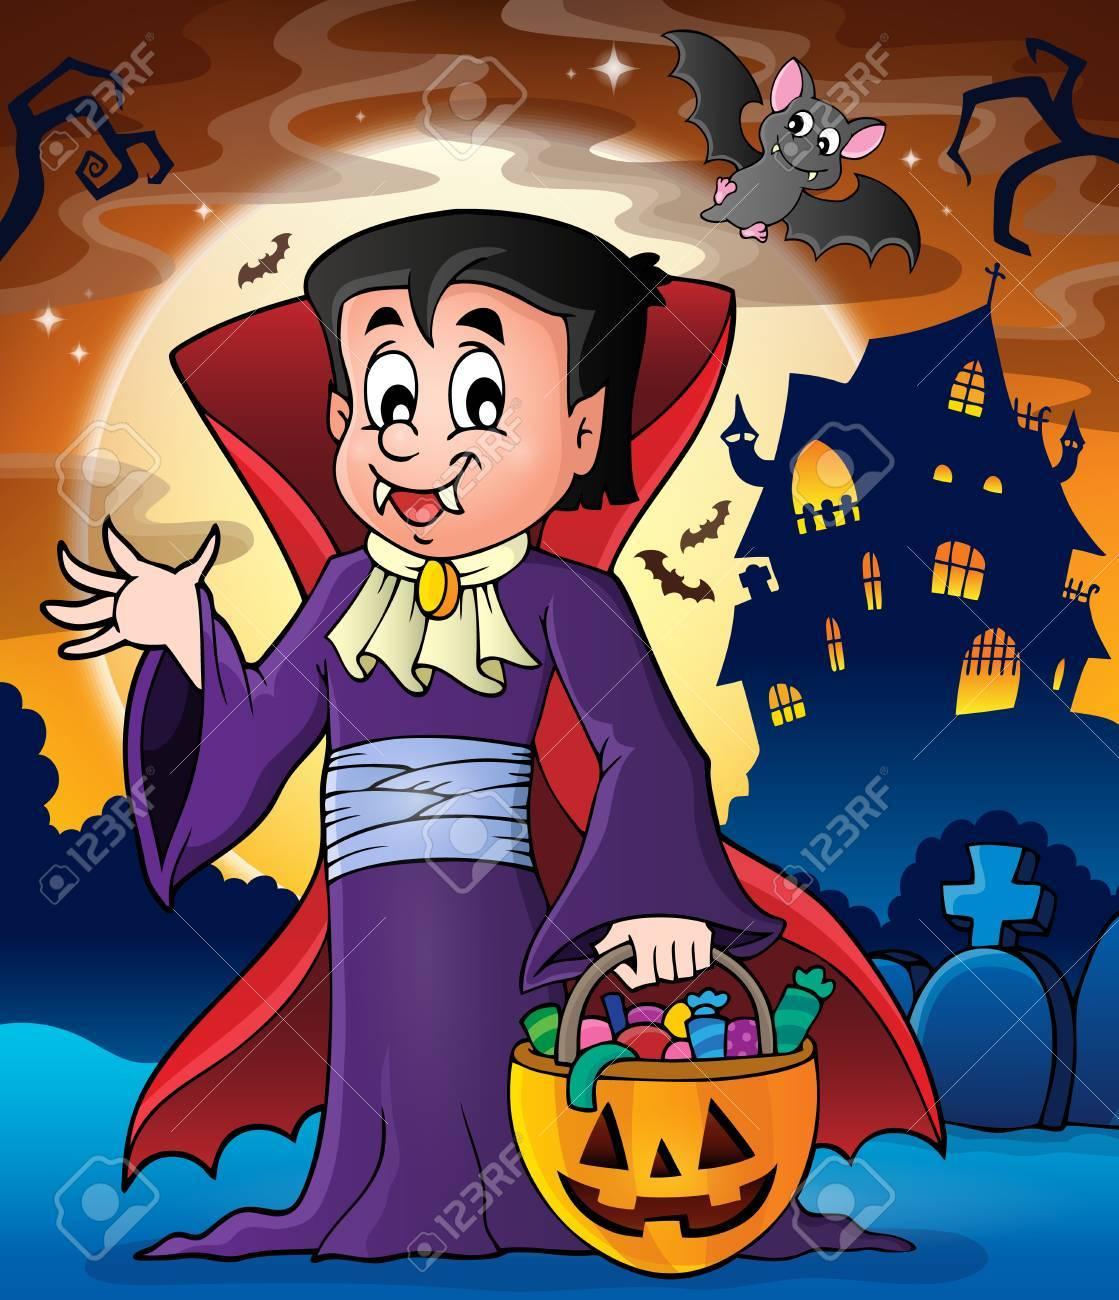 Halloween Vampire Theme Image 2 Stock Vector 44103410